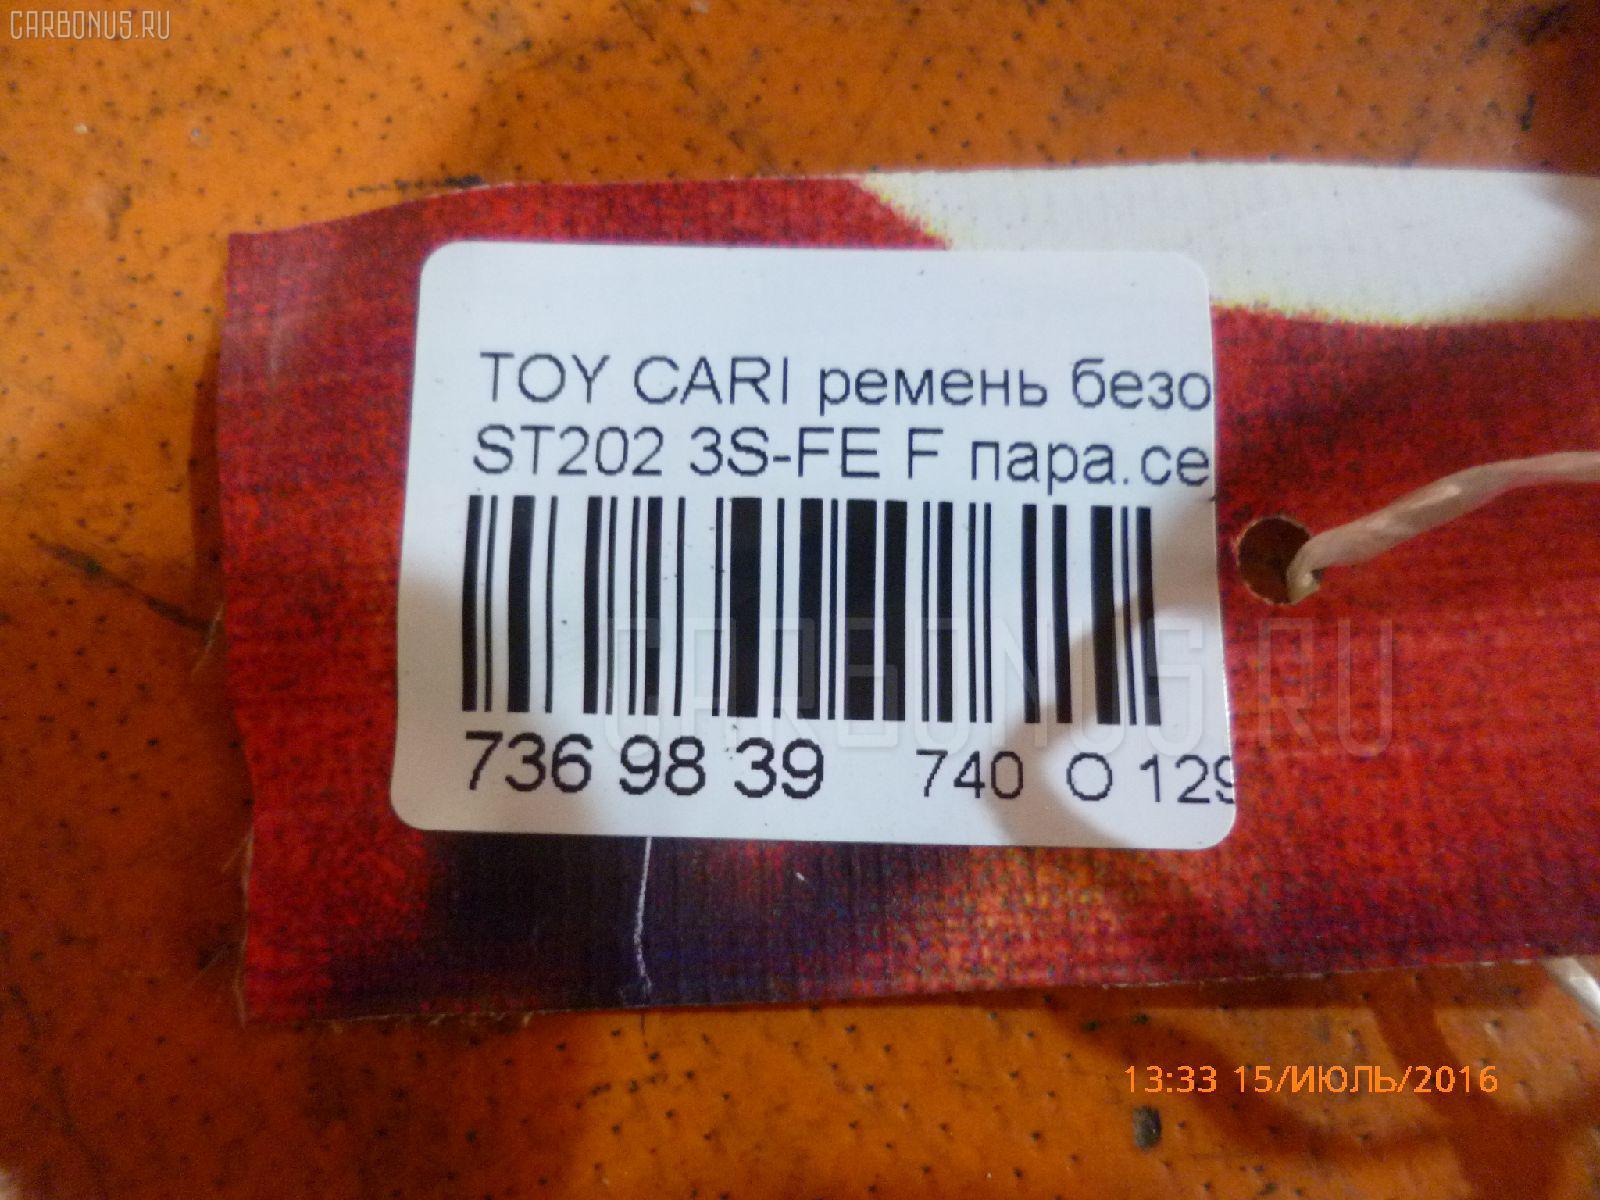 Ремень безопасности TOYOTA CARINA ED ST202 3S-FE Фото 2